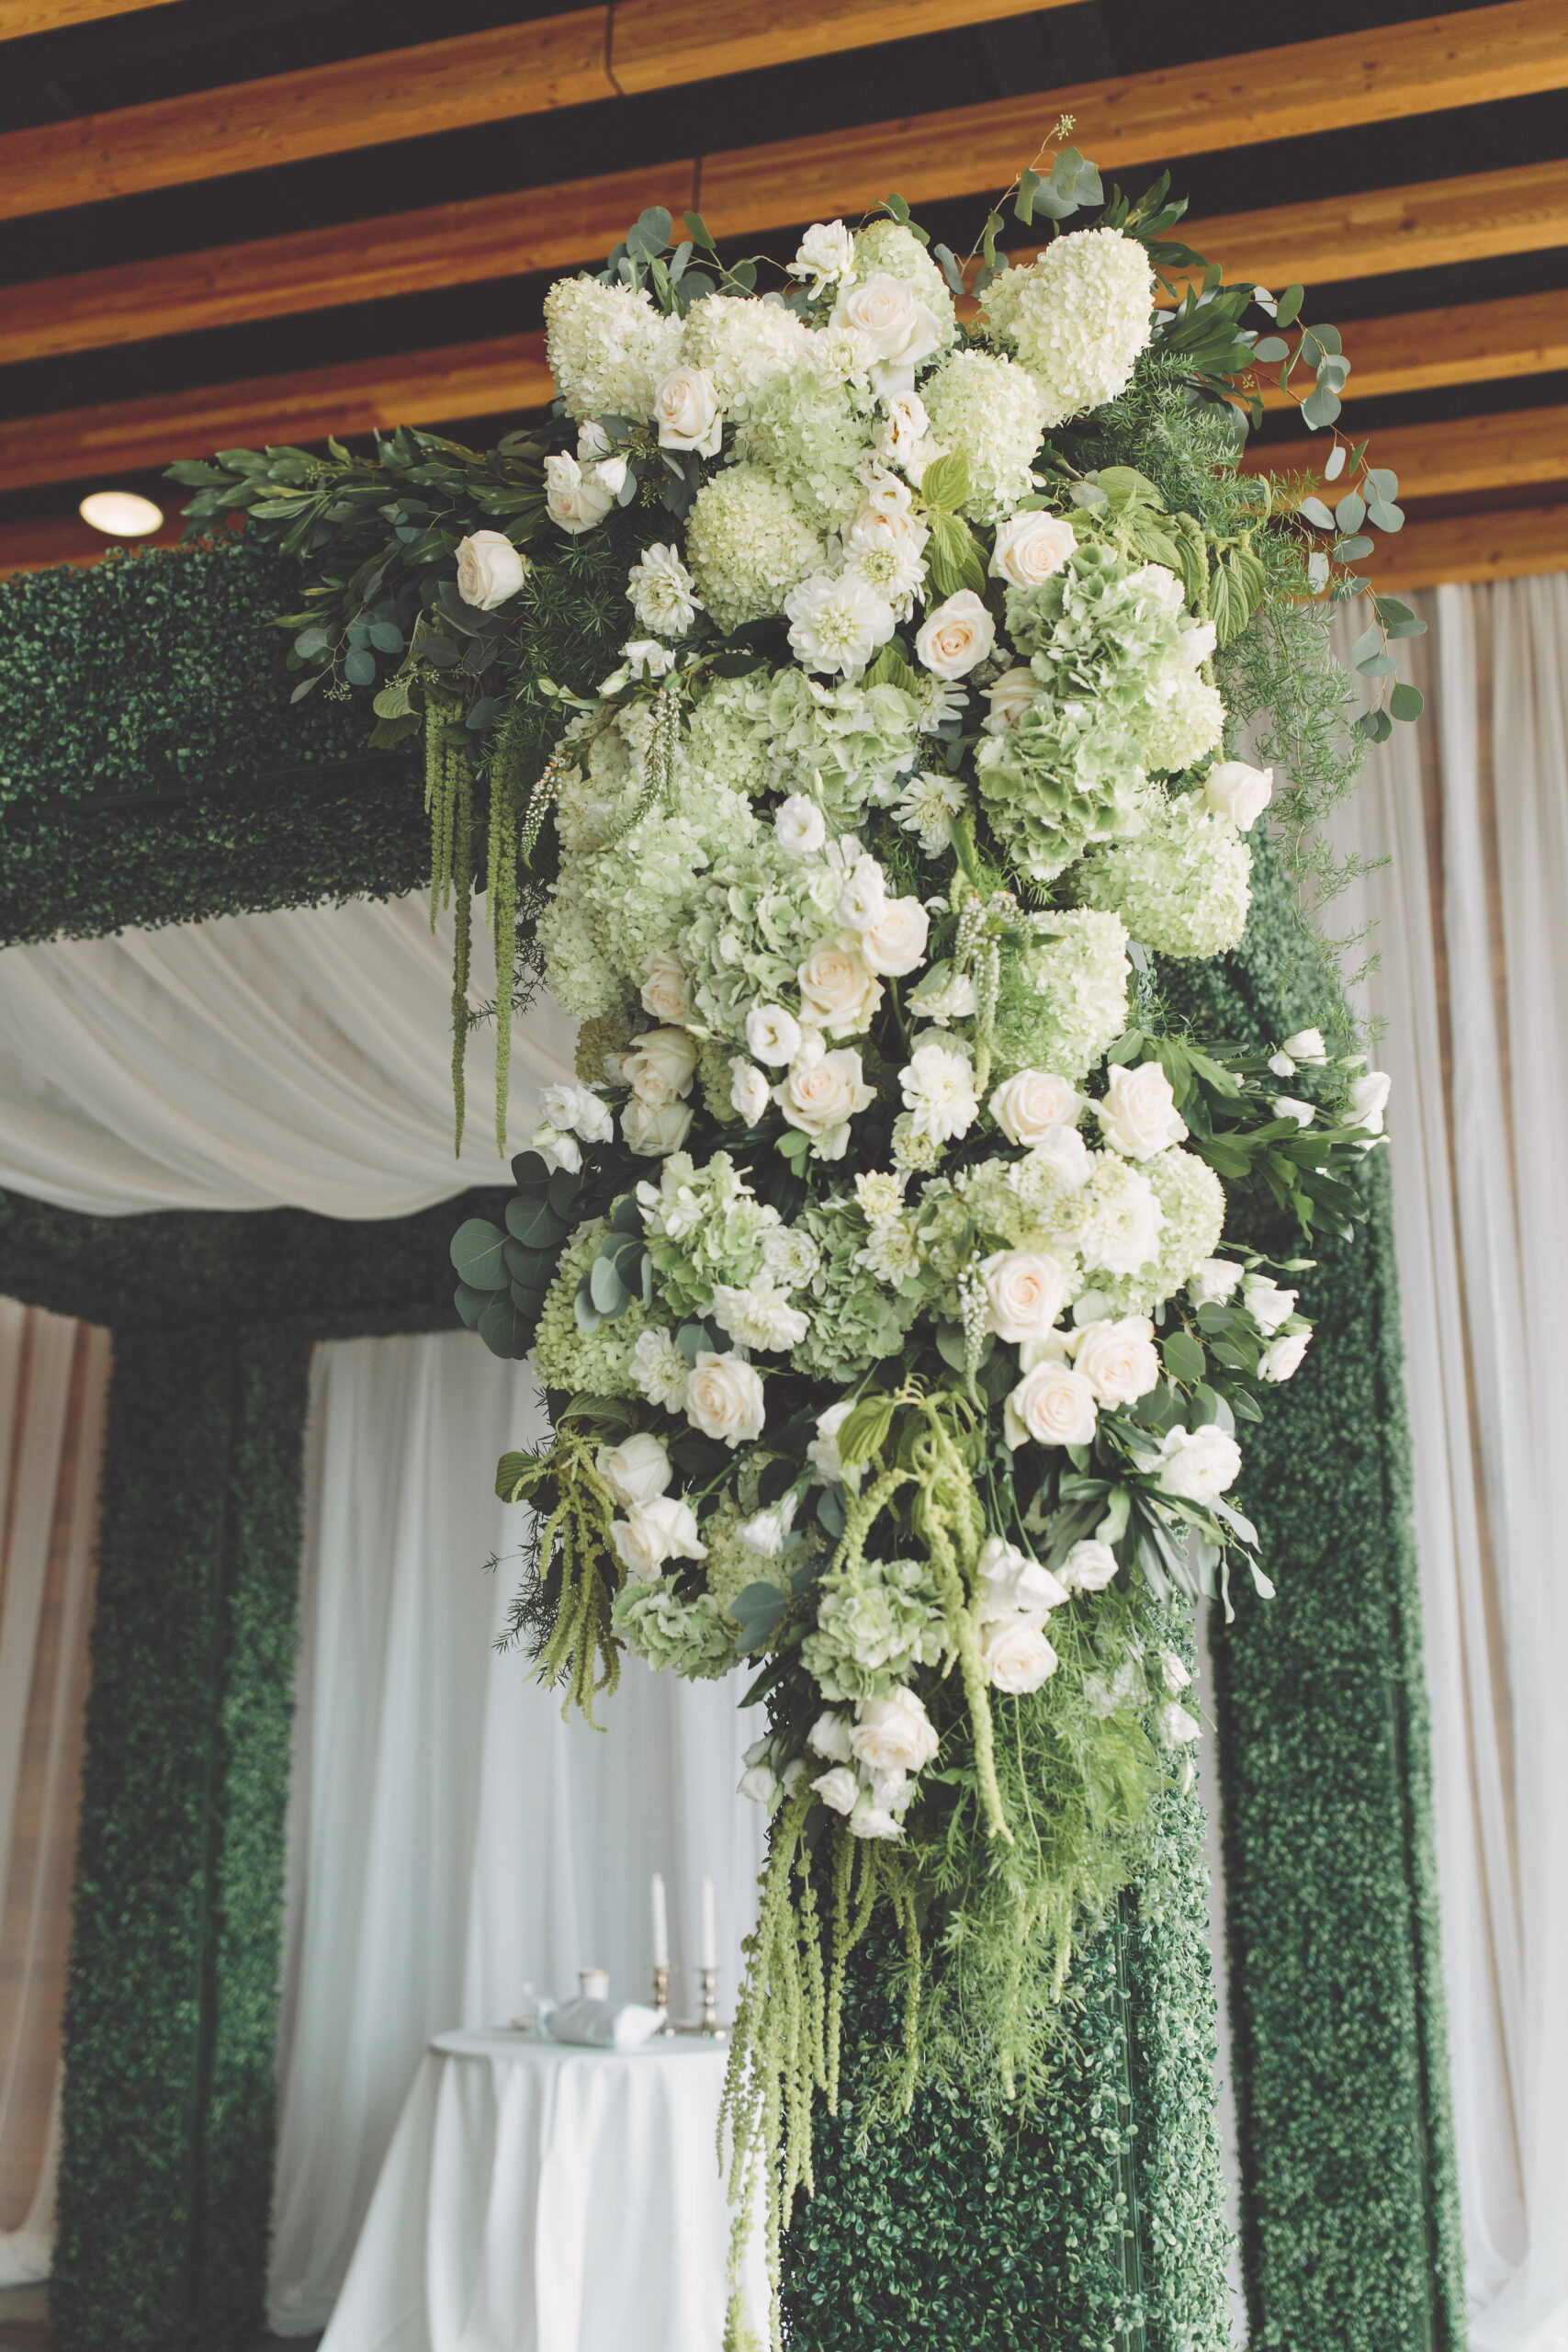 https://secureservercdn.net/45.40.145.151/kgq.ab5.myftpupload.com/wp-content/uploads/2020/04/Amanda-Daniel-Wedding-0392-scaled.jpg?time=1620836143